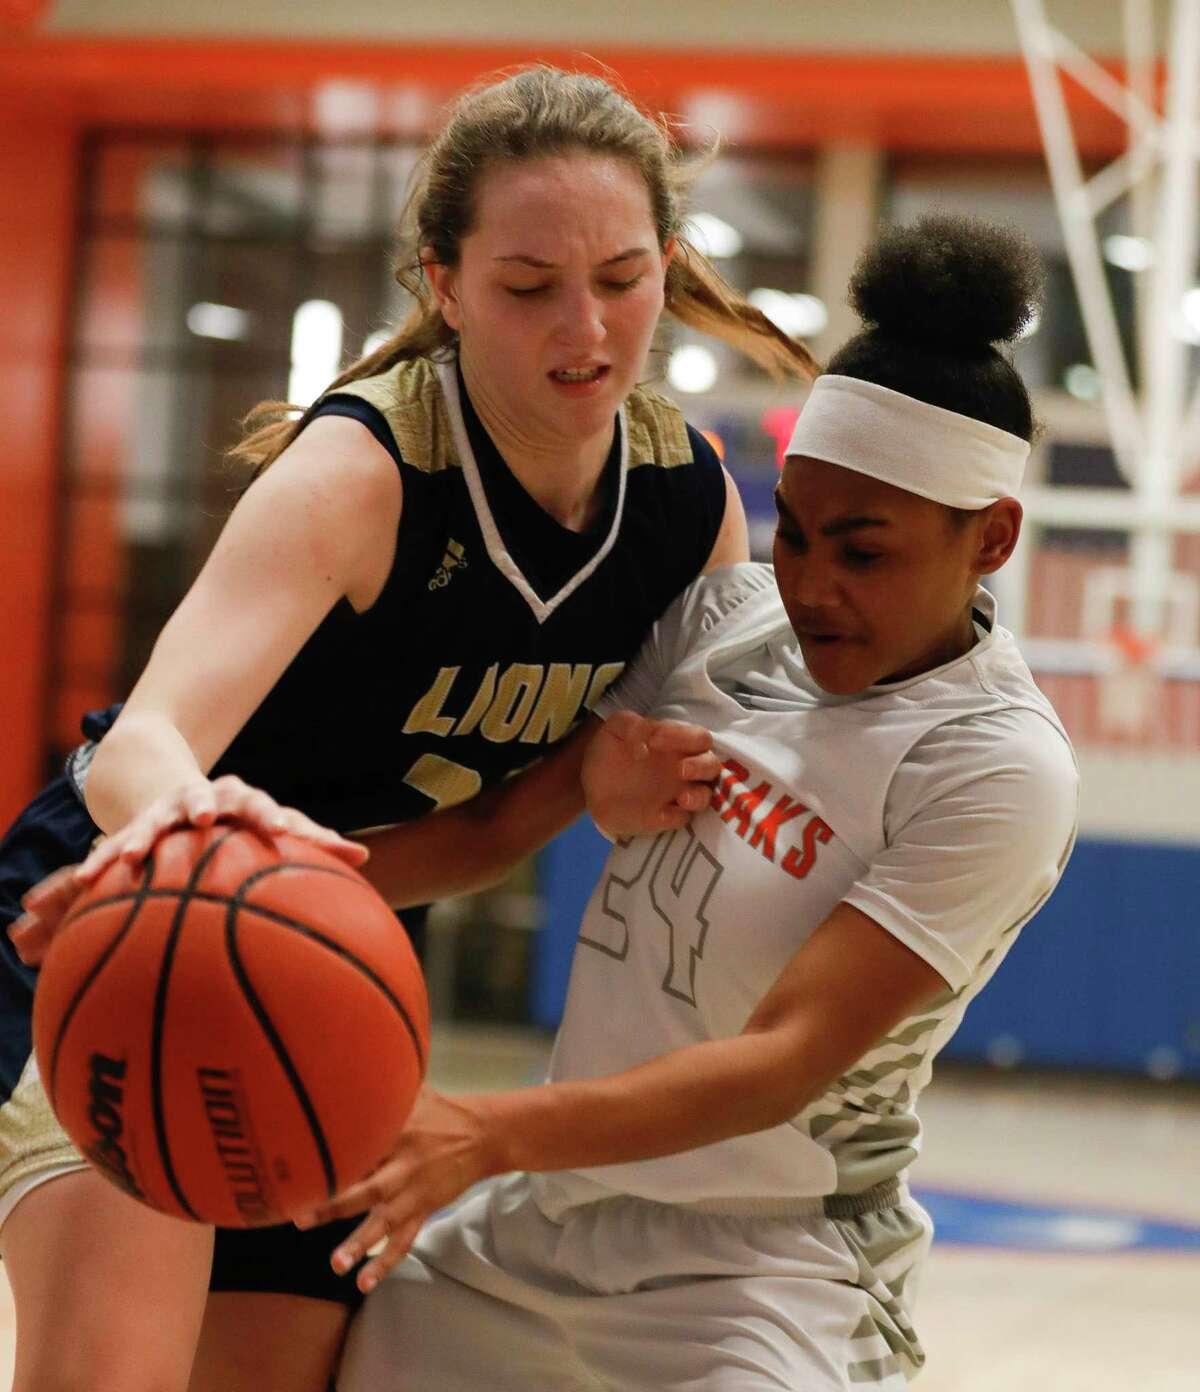 Grand Oaks guard Kaitlyn Stewart (24) fouls Lake Creek forward Natalie Murdock (25) during the second quarter of a District 20-5A high school basketball game at Grand Oaks High School, Friday, Jan. 17, 2020, in Spring.